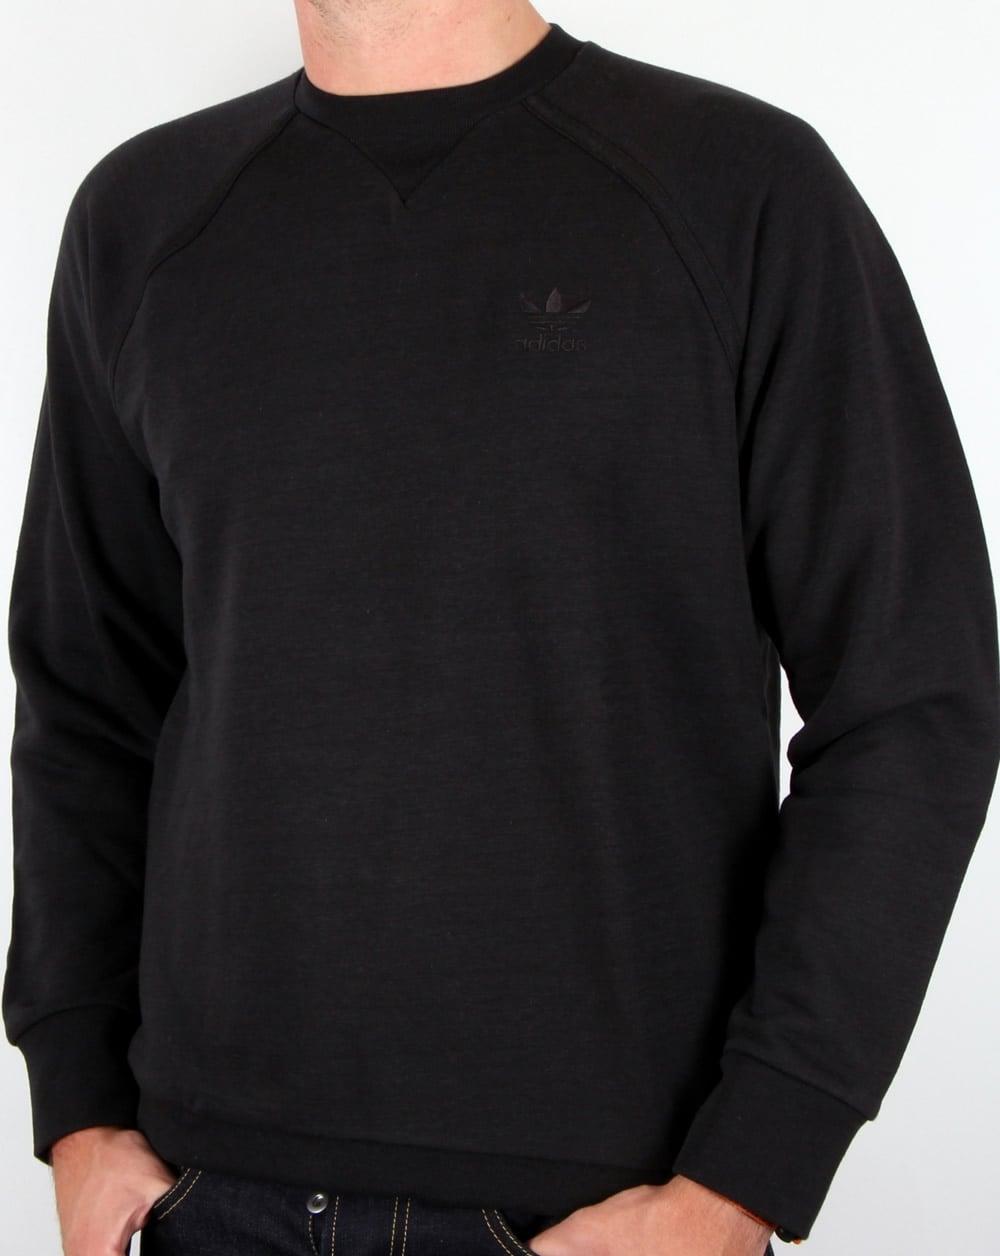 adidas original jumper